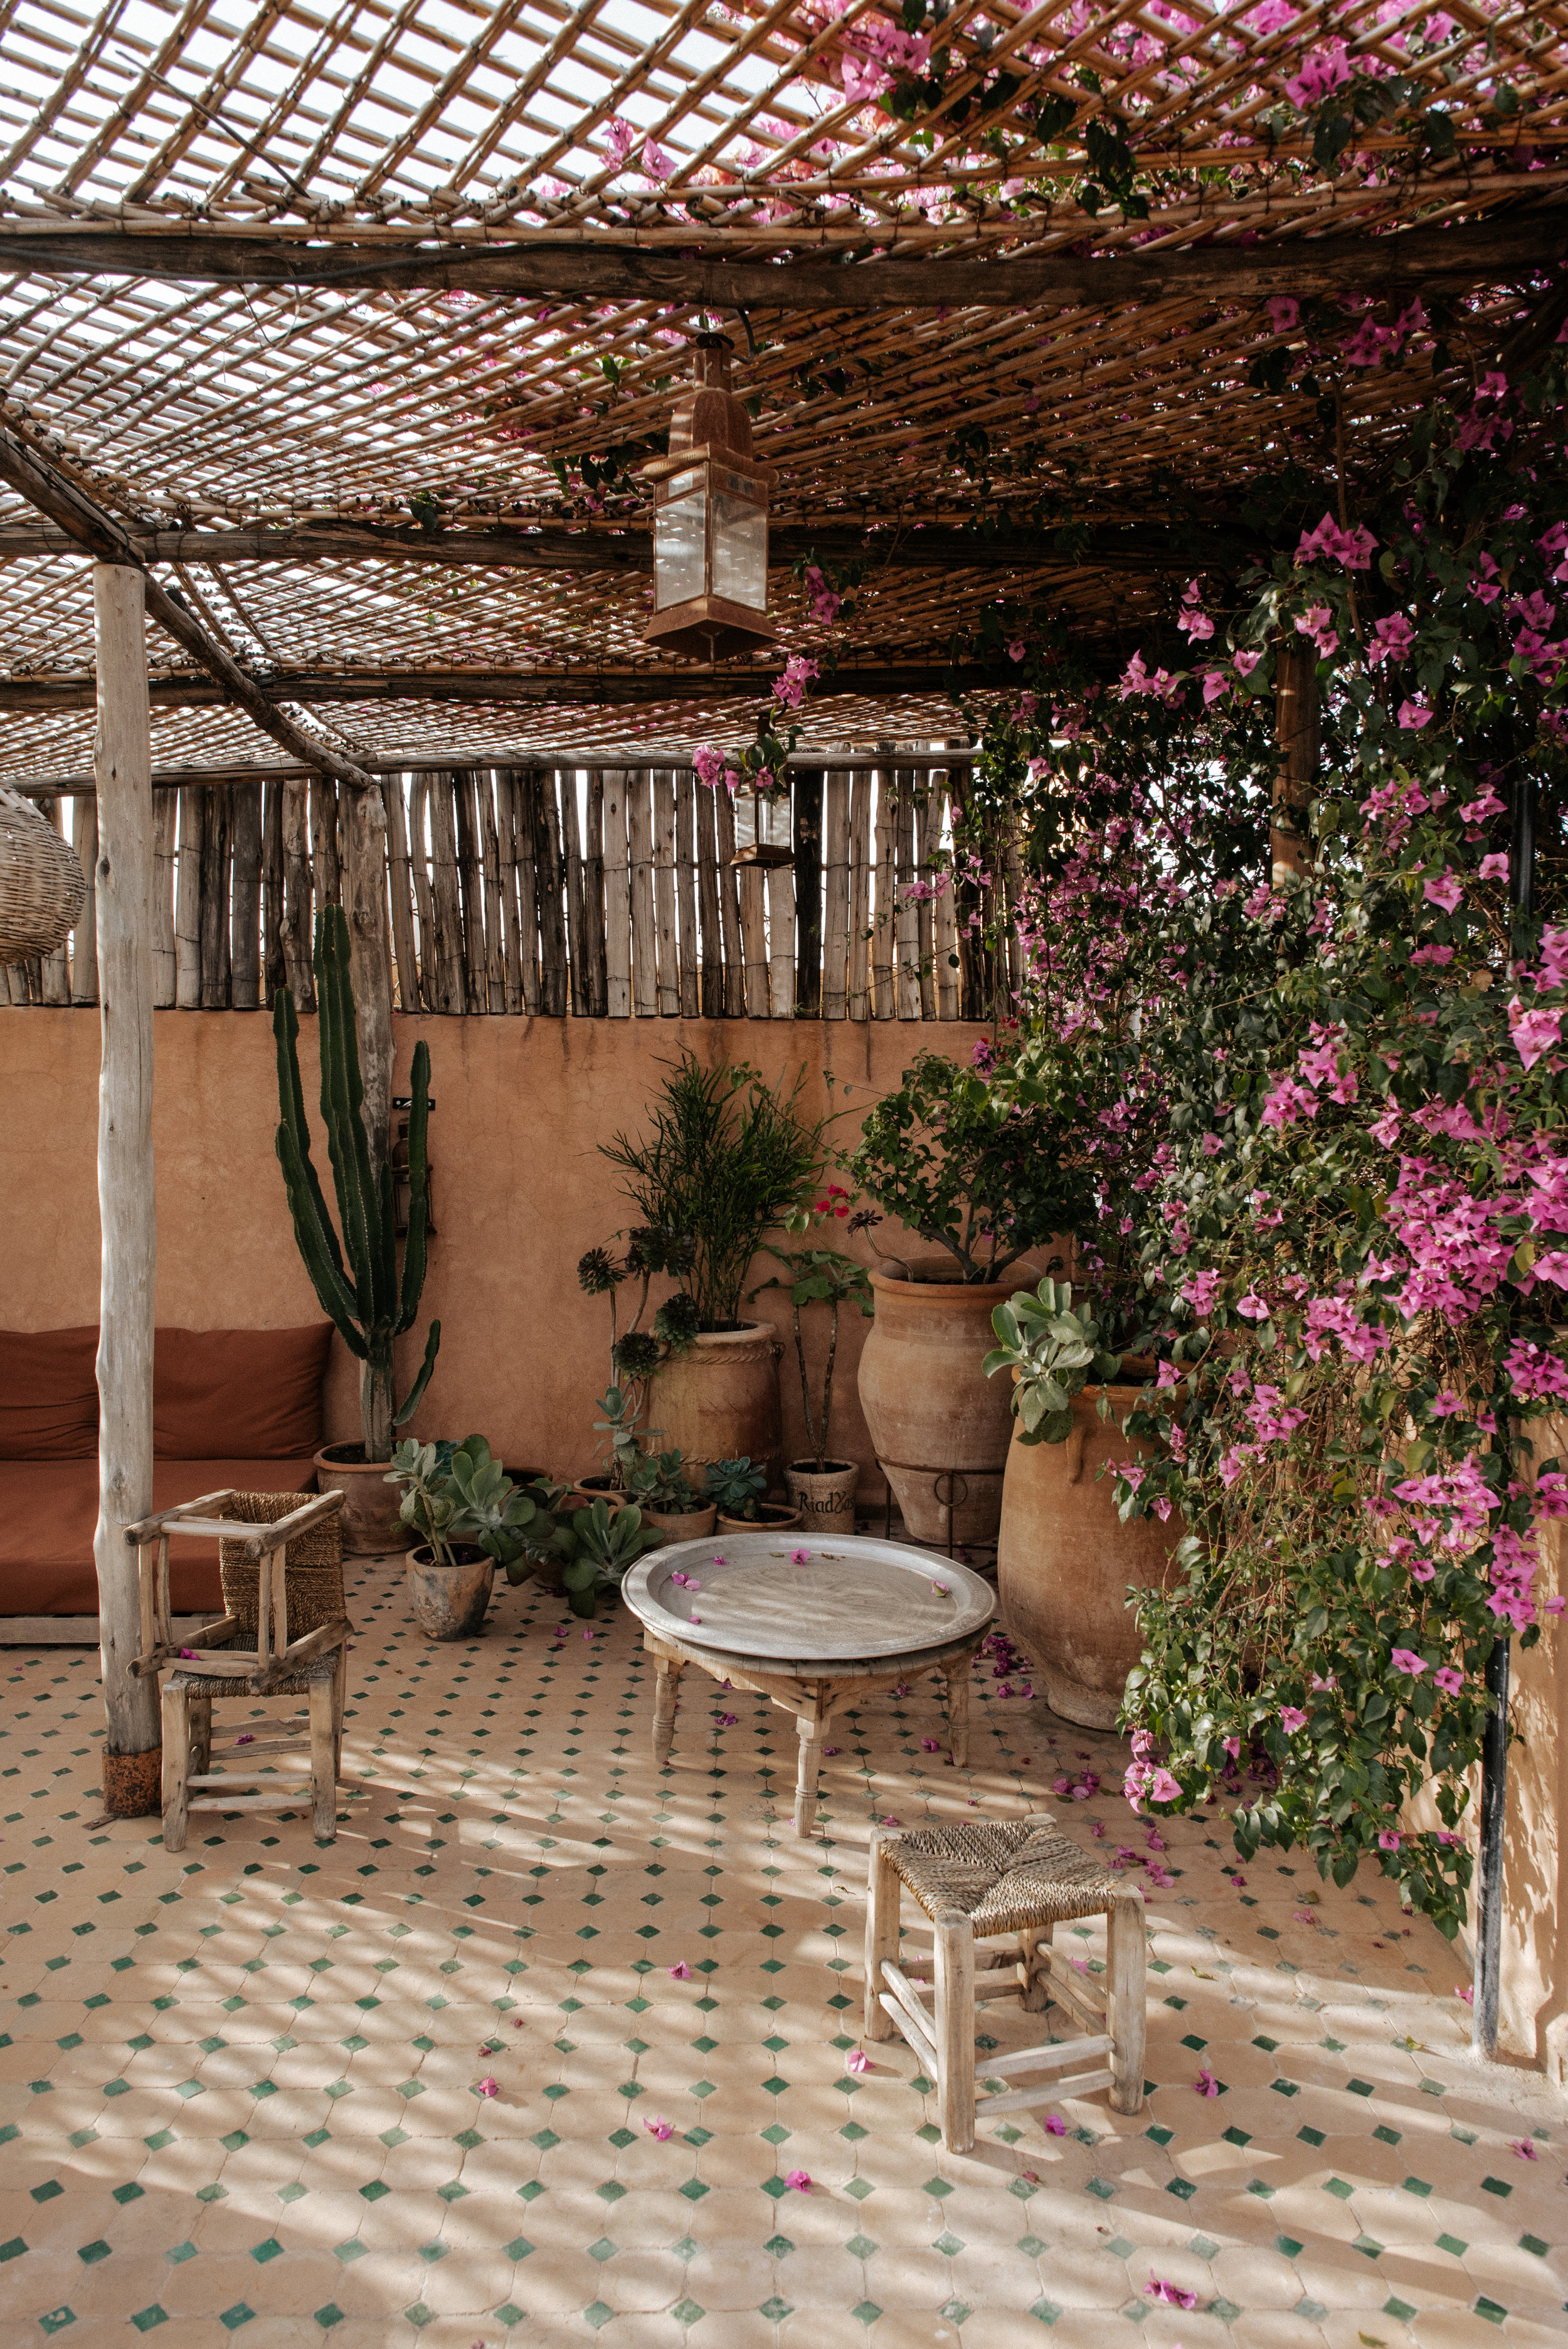 Morocco-480.jpg